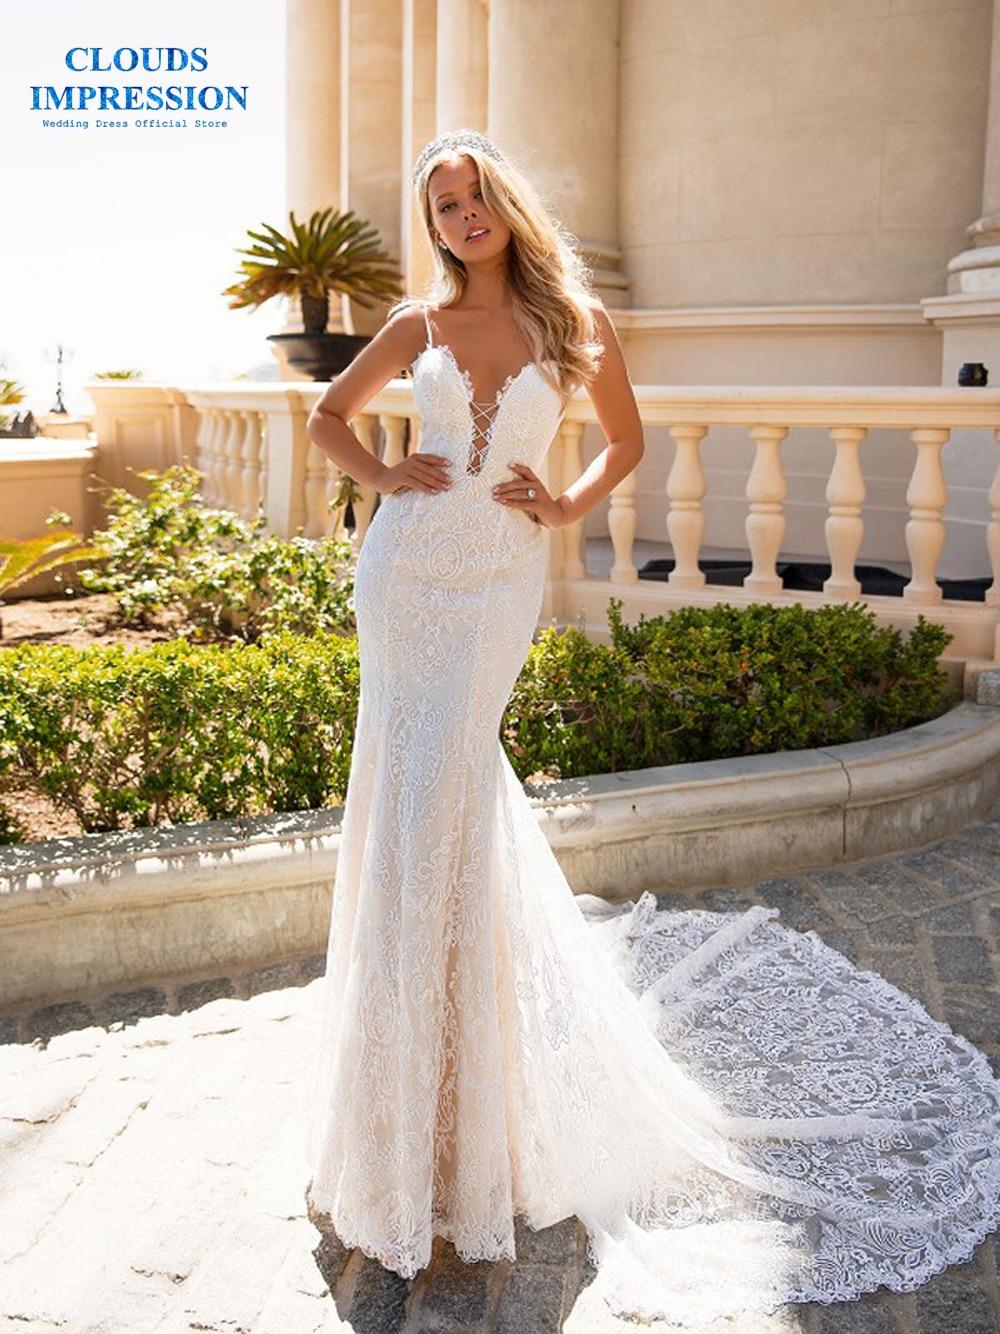 CLOUDS IMPRESSION Sexy Gorgeous Mermaid 2019 Wedding Dress Beading Deep V neck Lace Plus Size Vestige